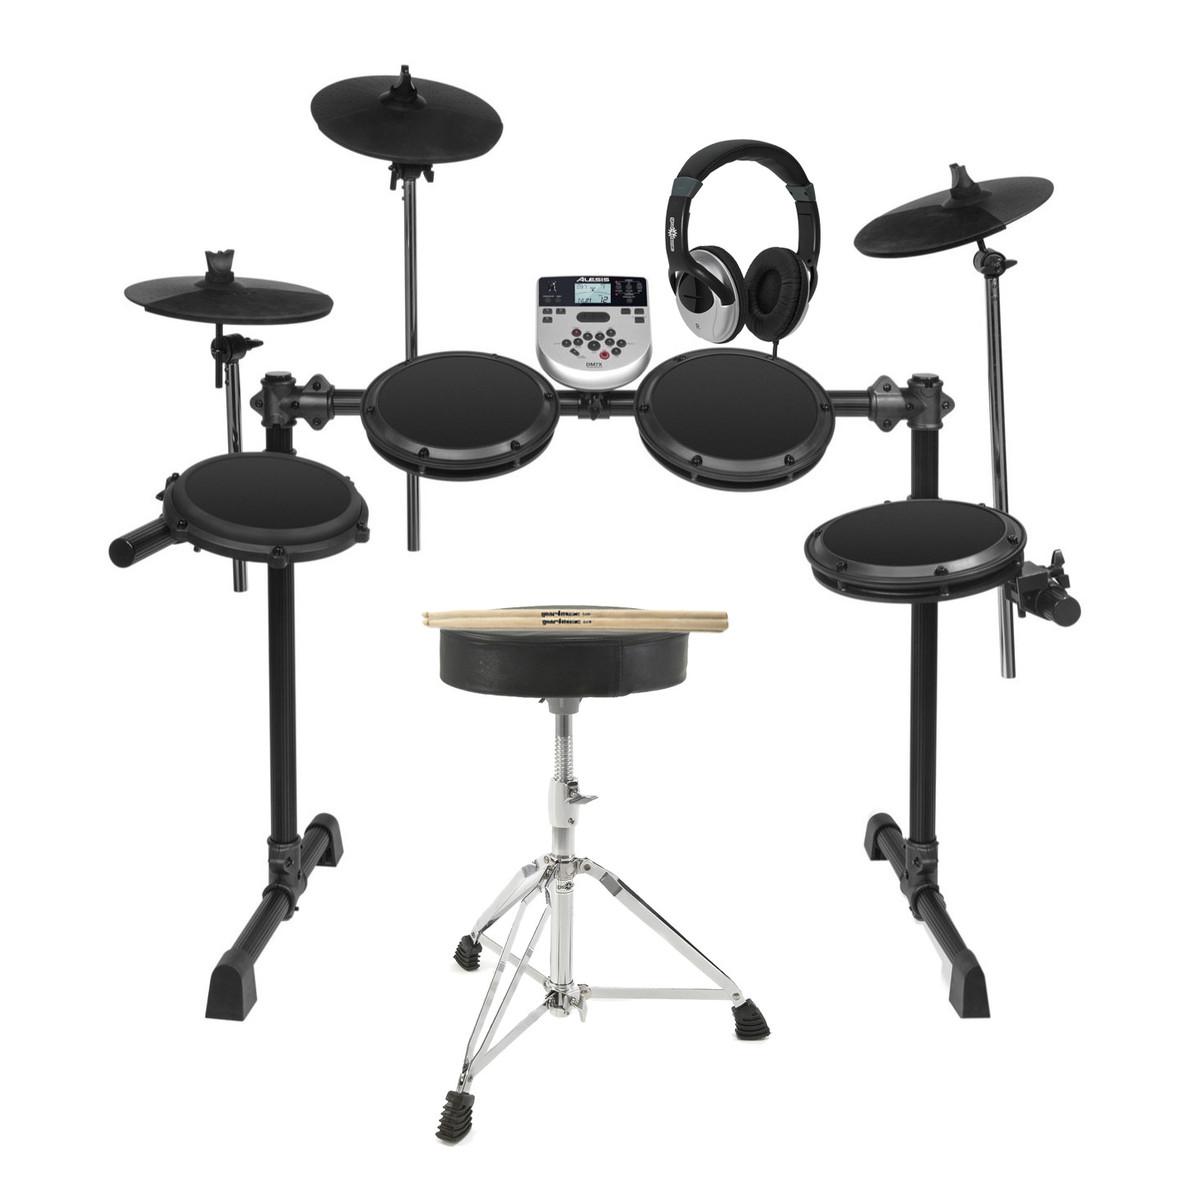 DISC Alesis DM7X Electric Drum Kit with Free Sticks, Stool